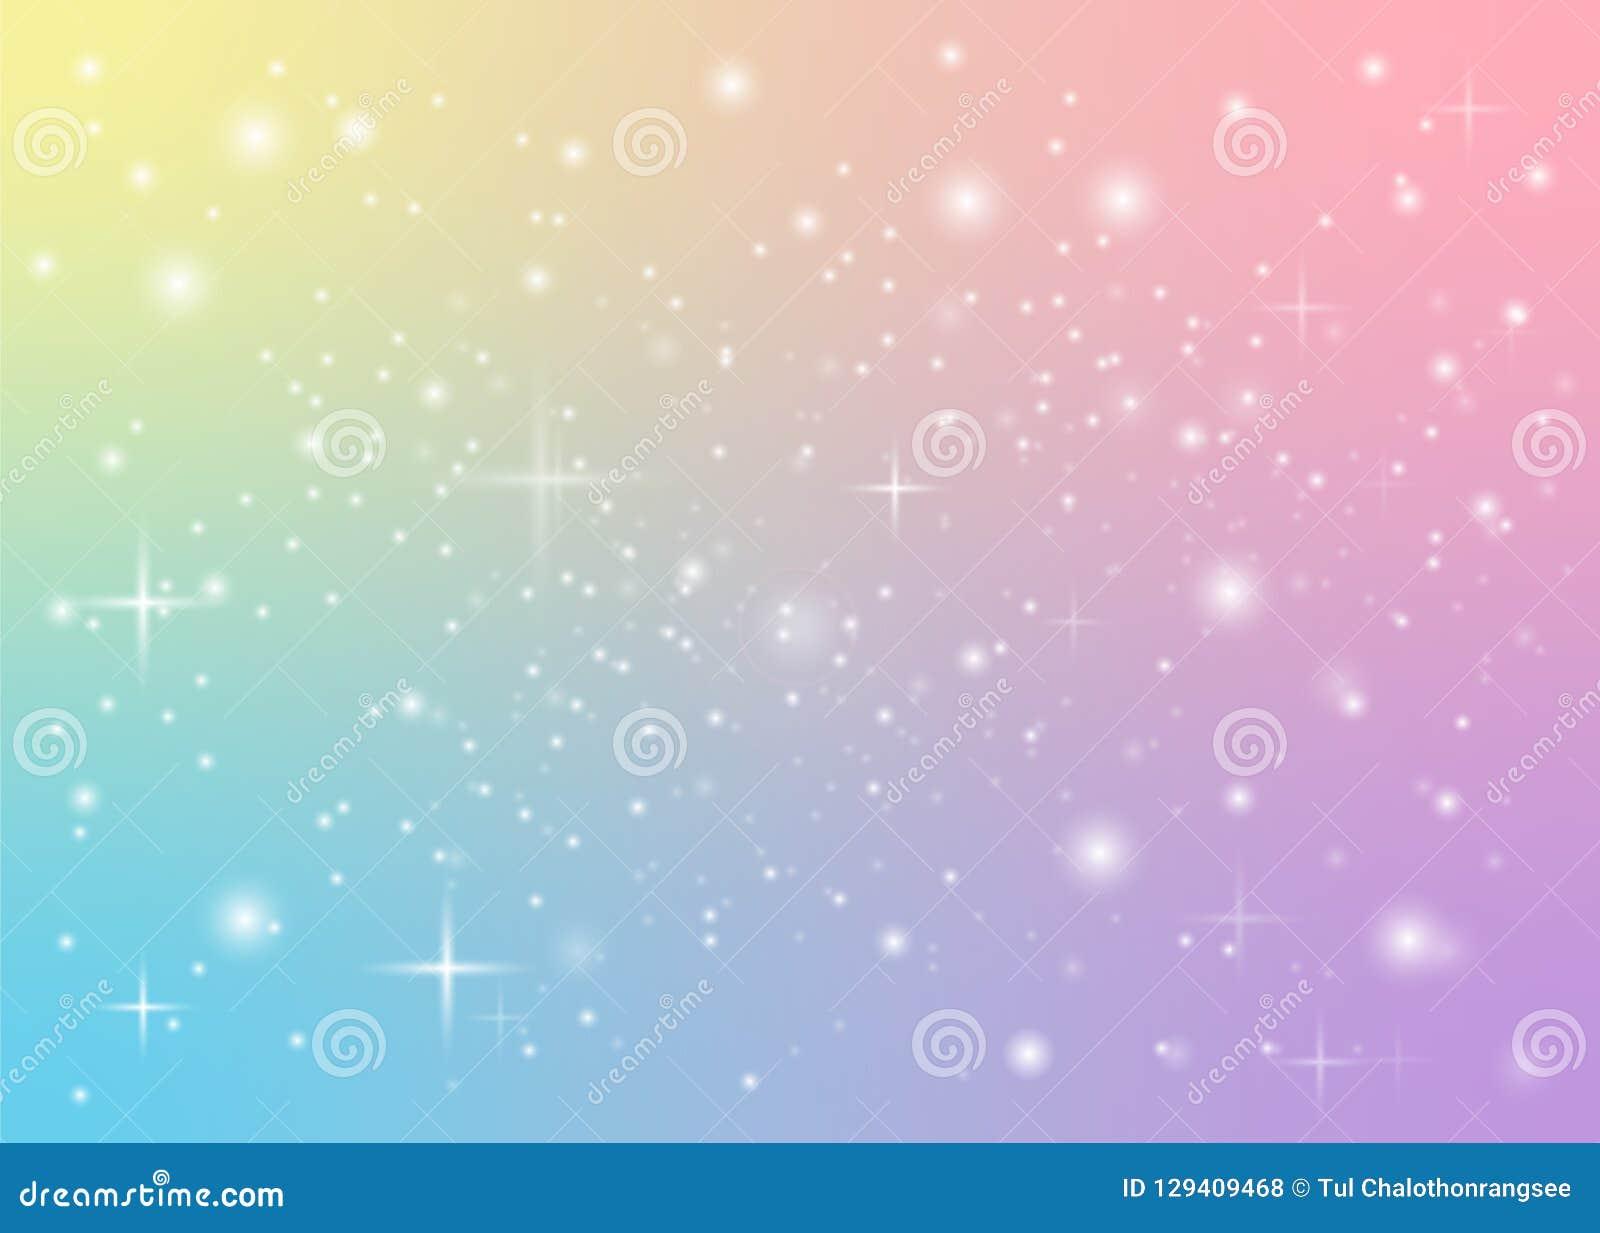 Rainbow Pastel Background Stock Illustration Illustration Of Party 129409468